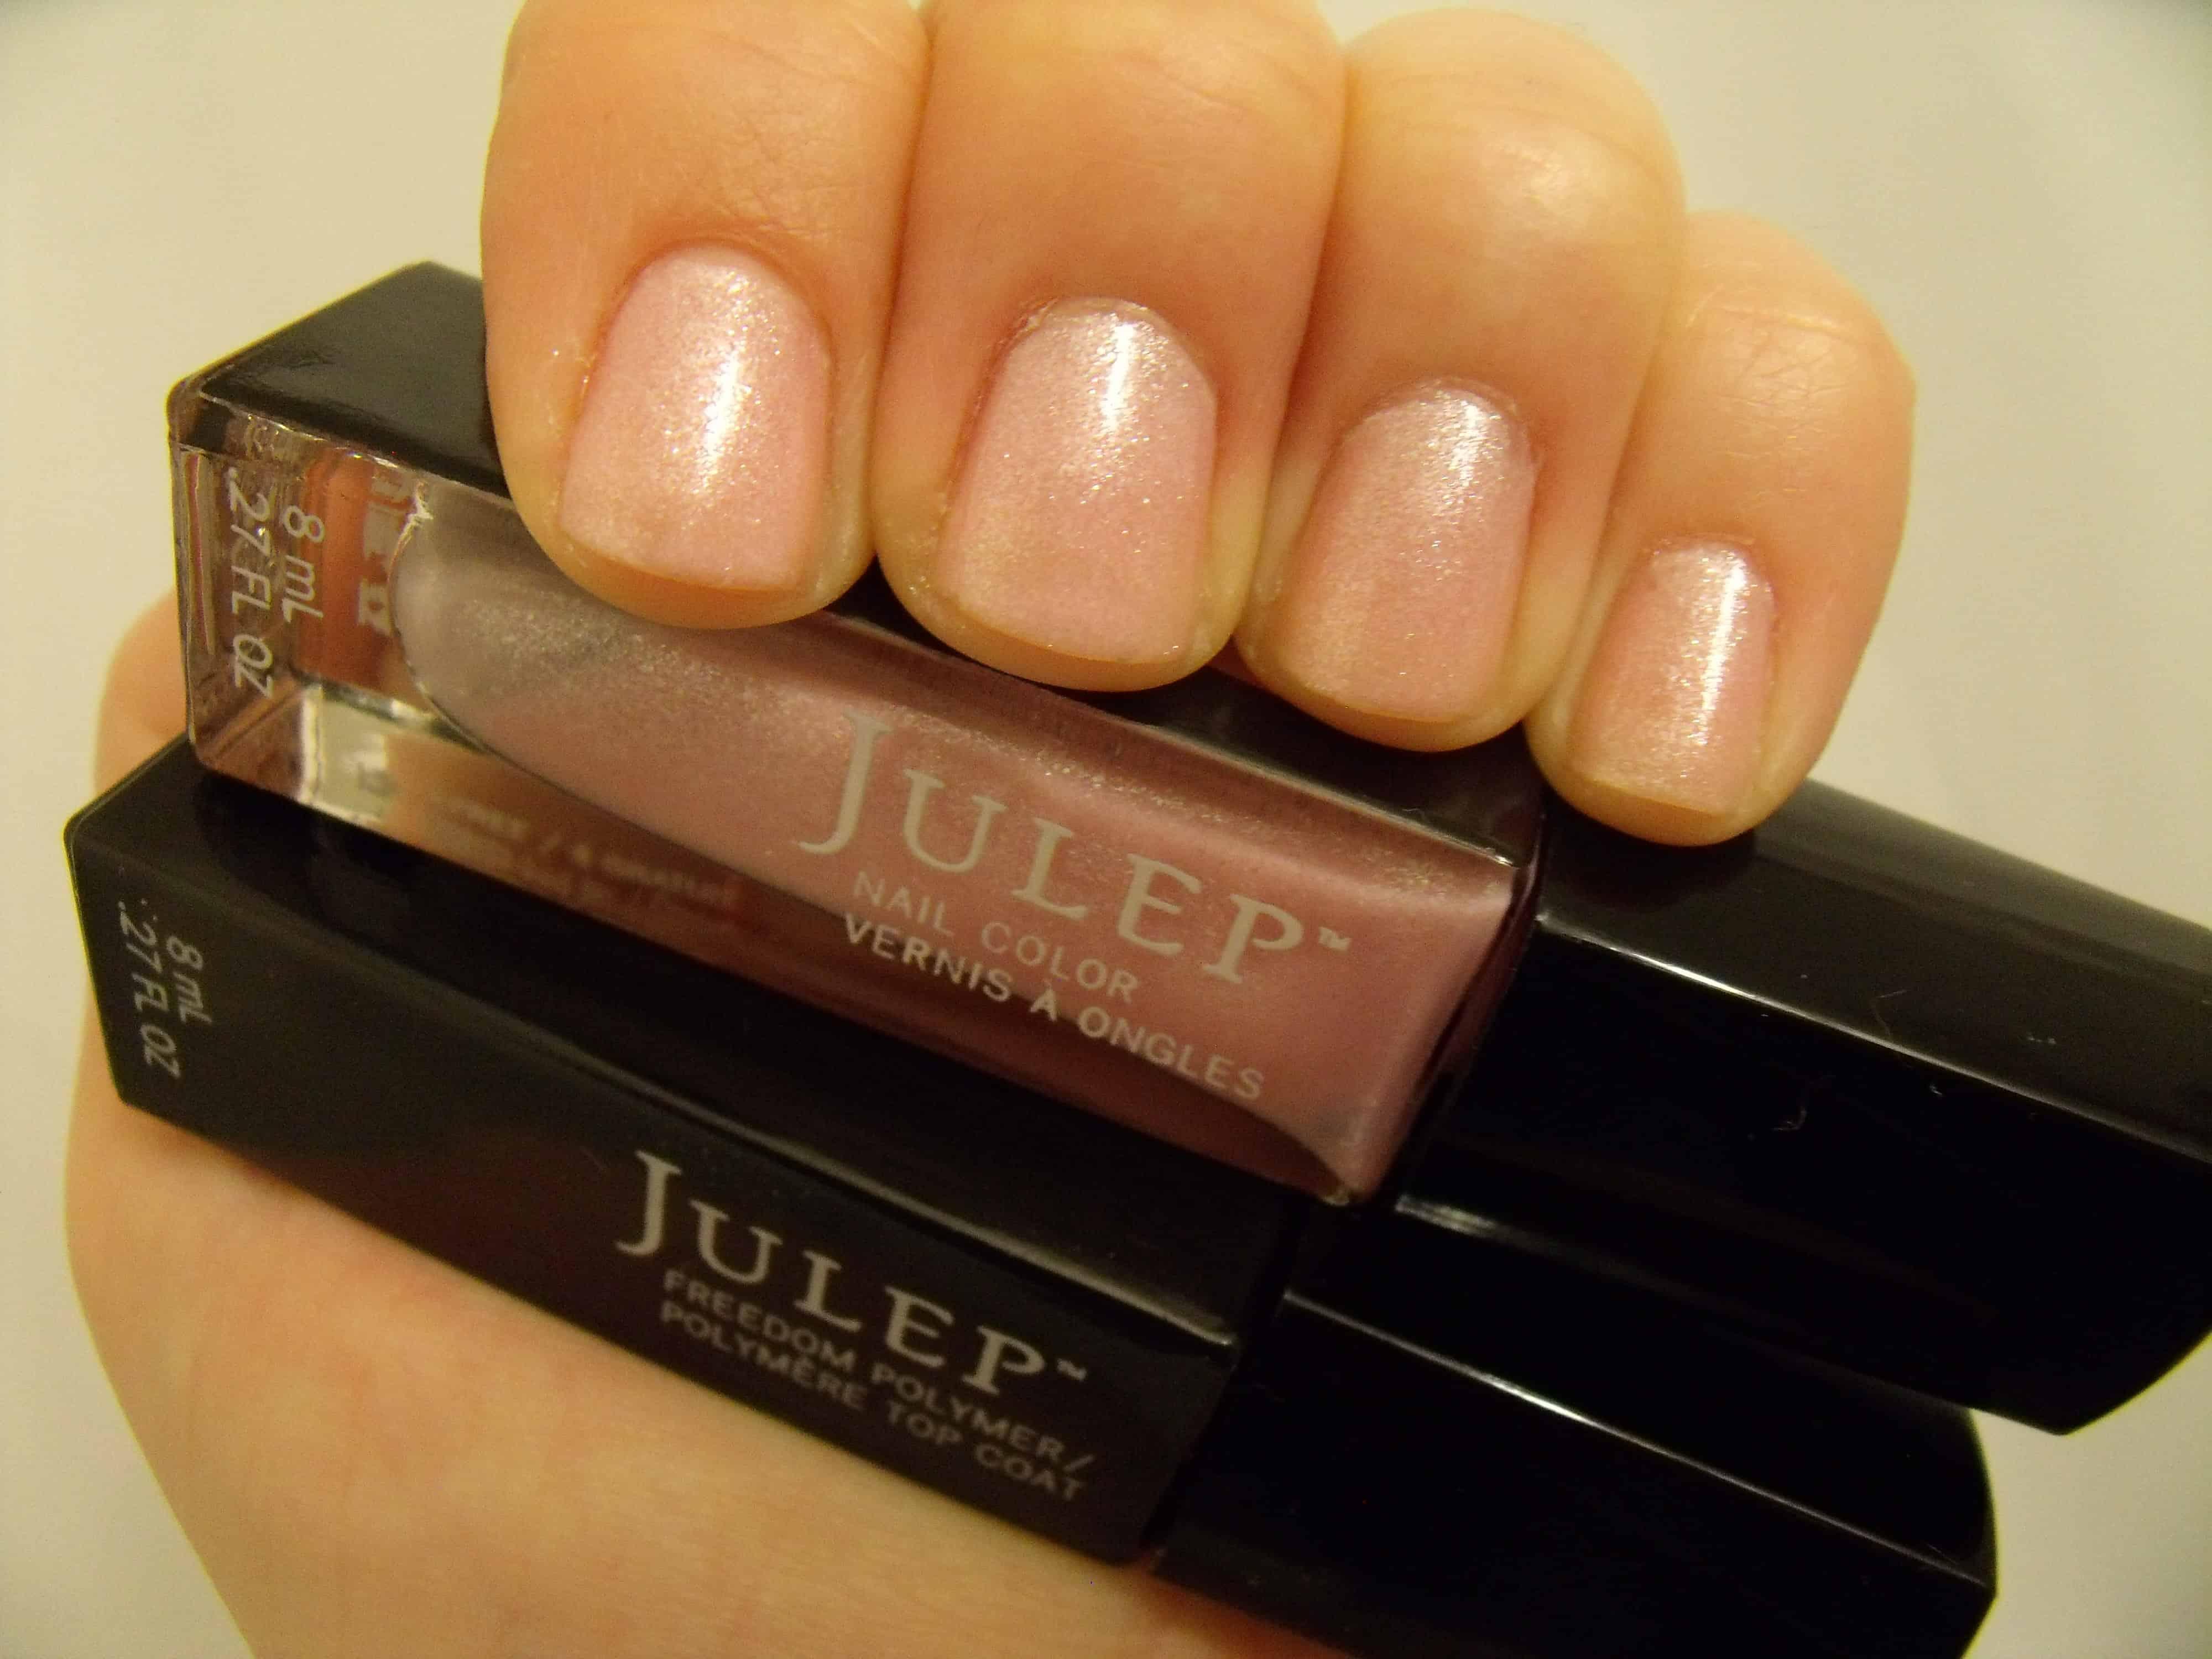 Julep Nail Polish Review & Swatch: Audrey - GirlGetGlamorous